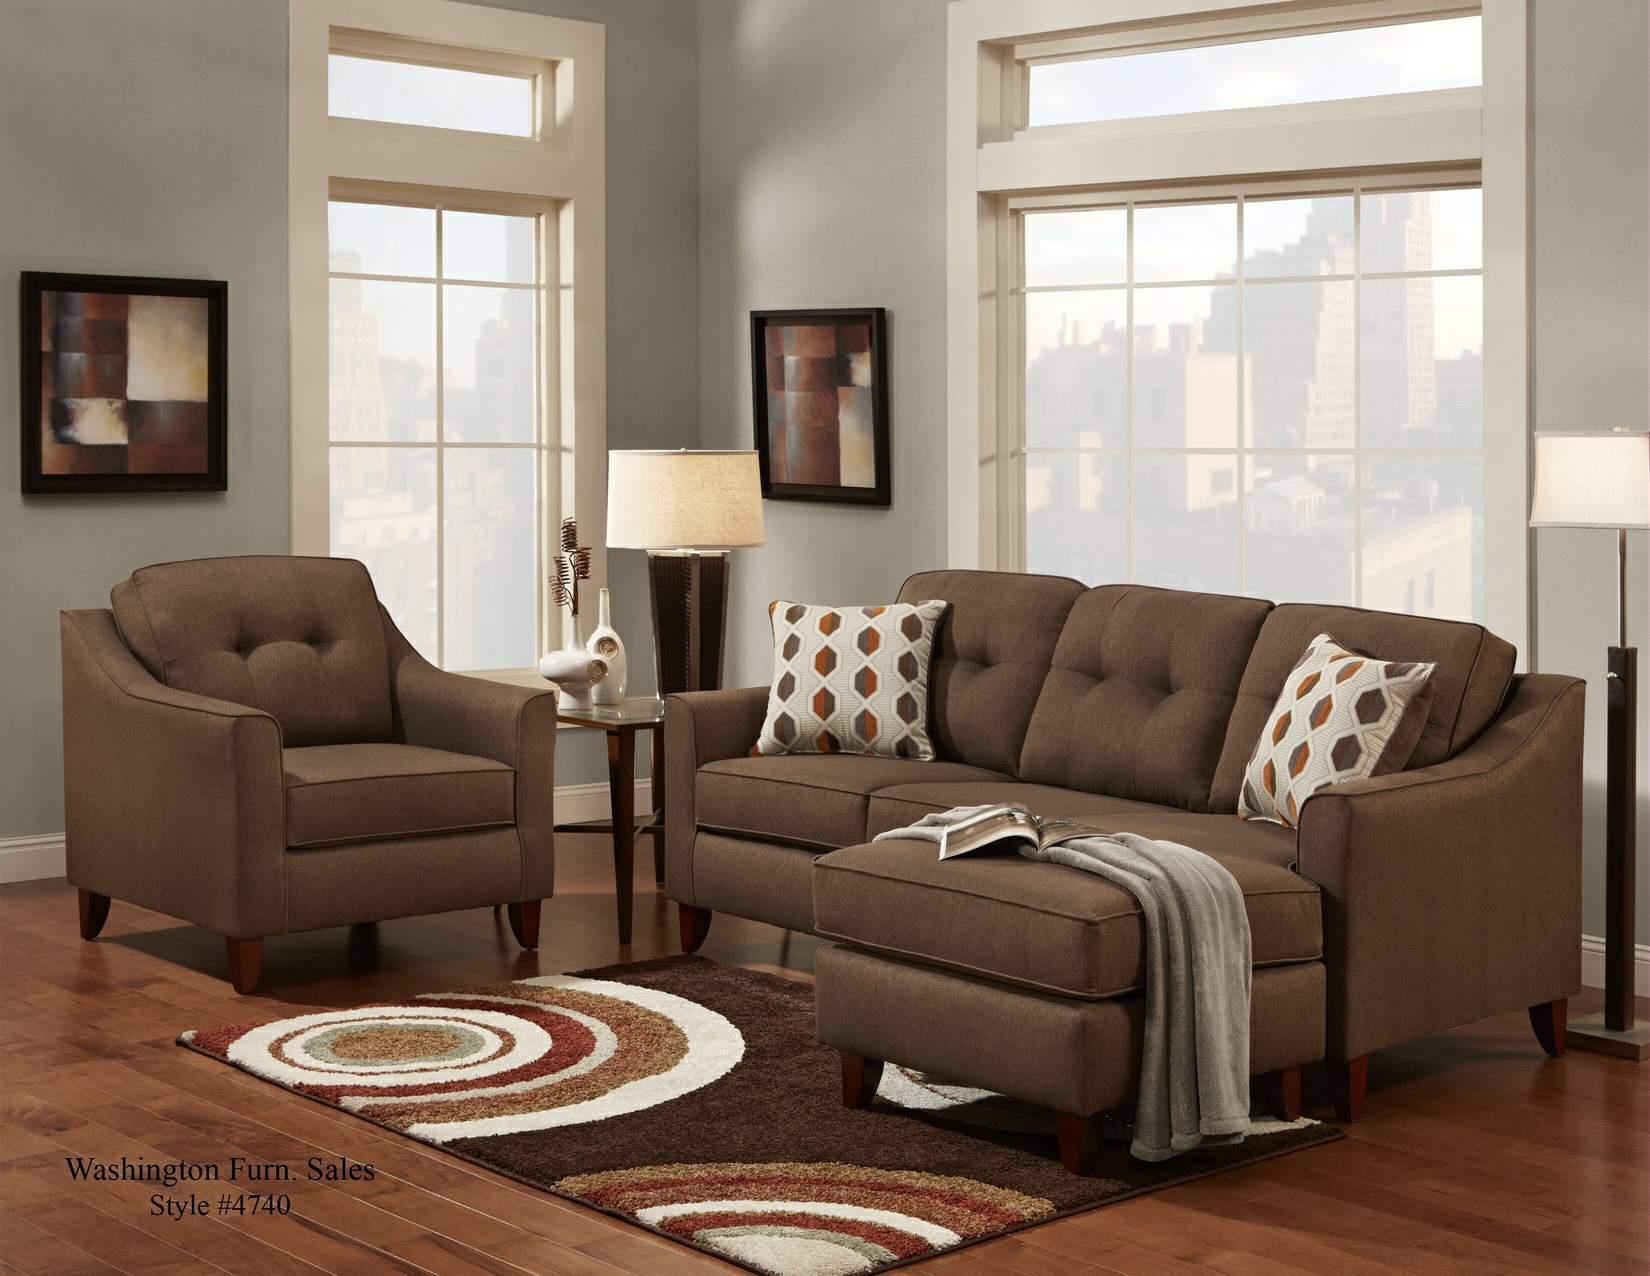 Washington Furniture Stoked Wash 4743 586 Stoked Chocolate Sofa Chaise Great American Home